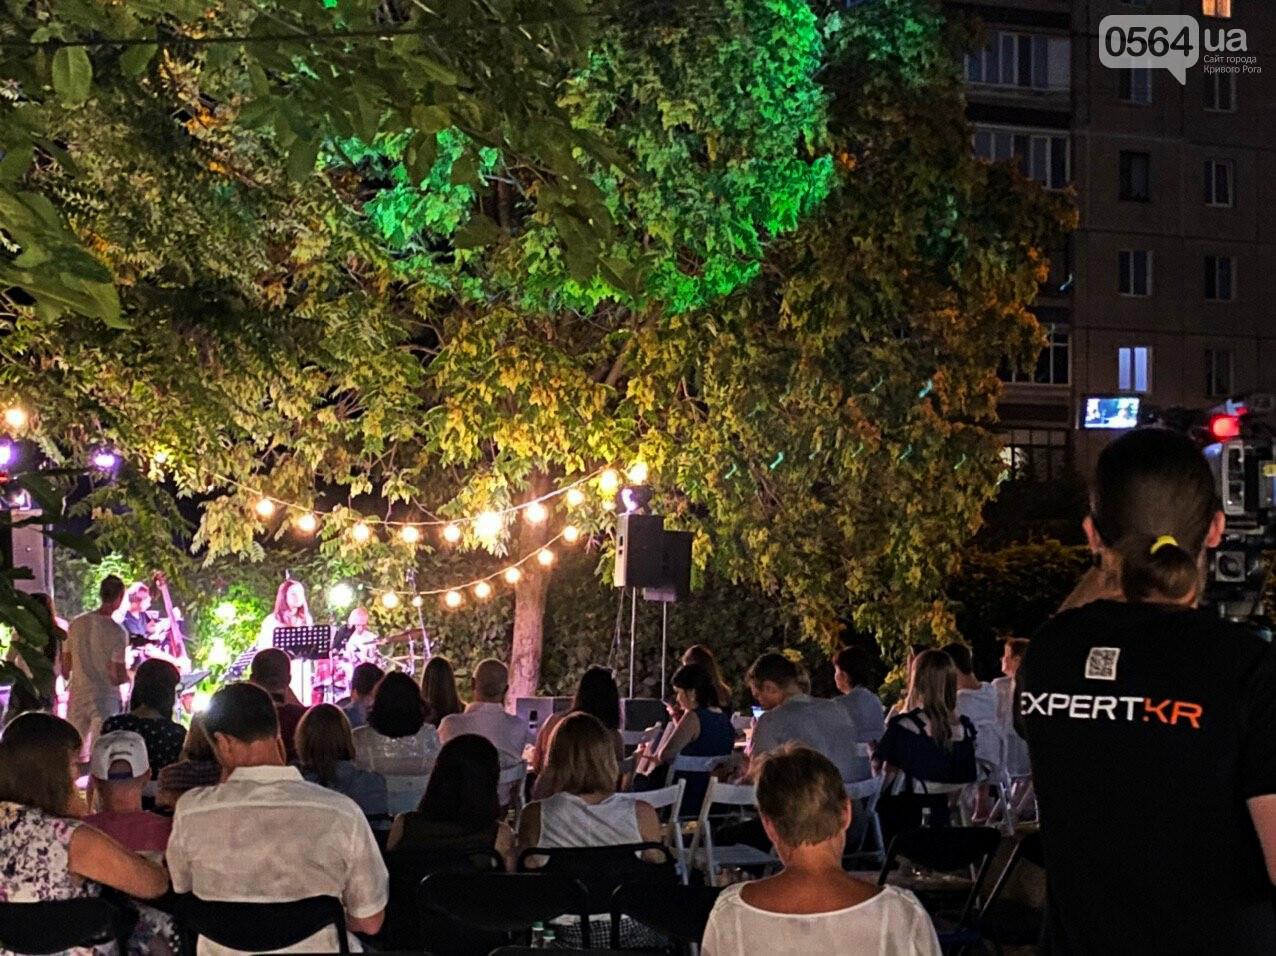 Под звездным небом криворожане наслаждались летним джазом от  Advantage Project, - ФОТО, ВИДЕО , фото-55